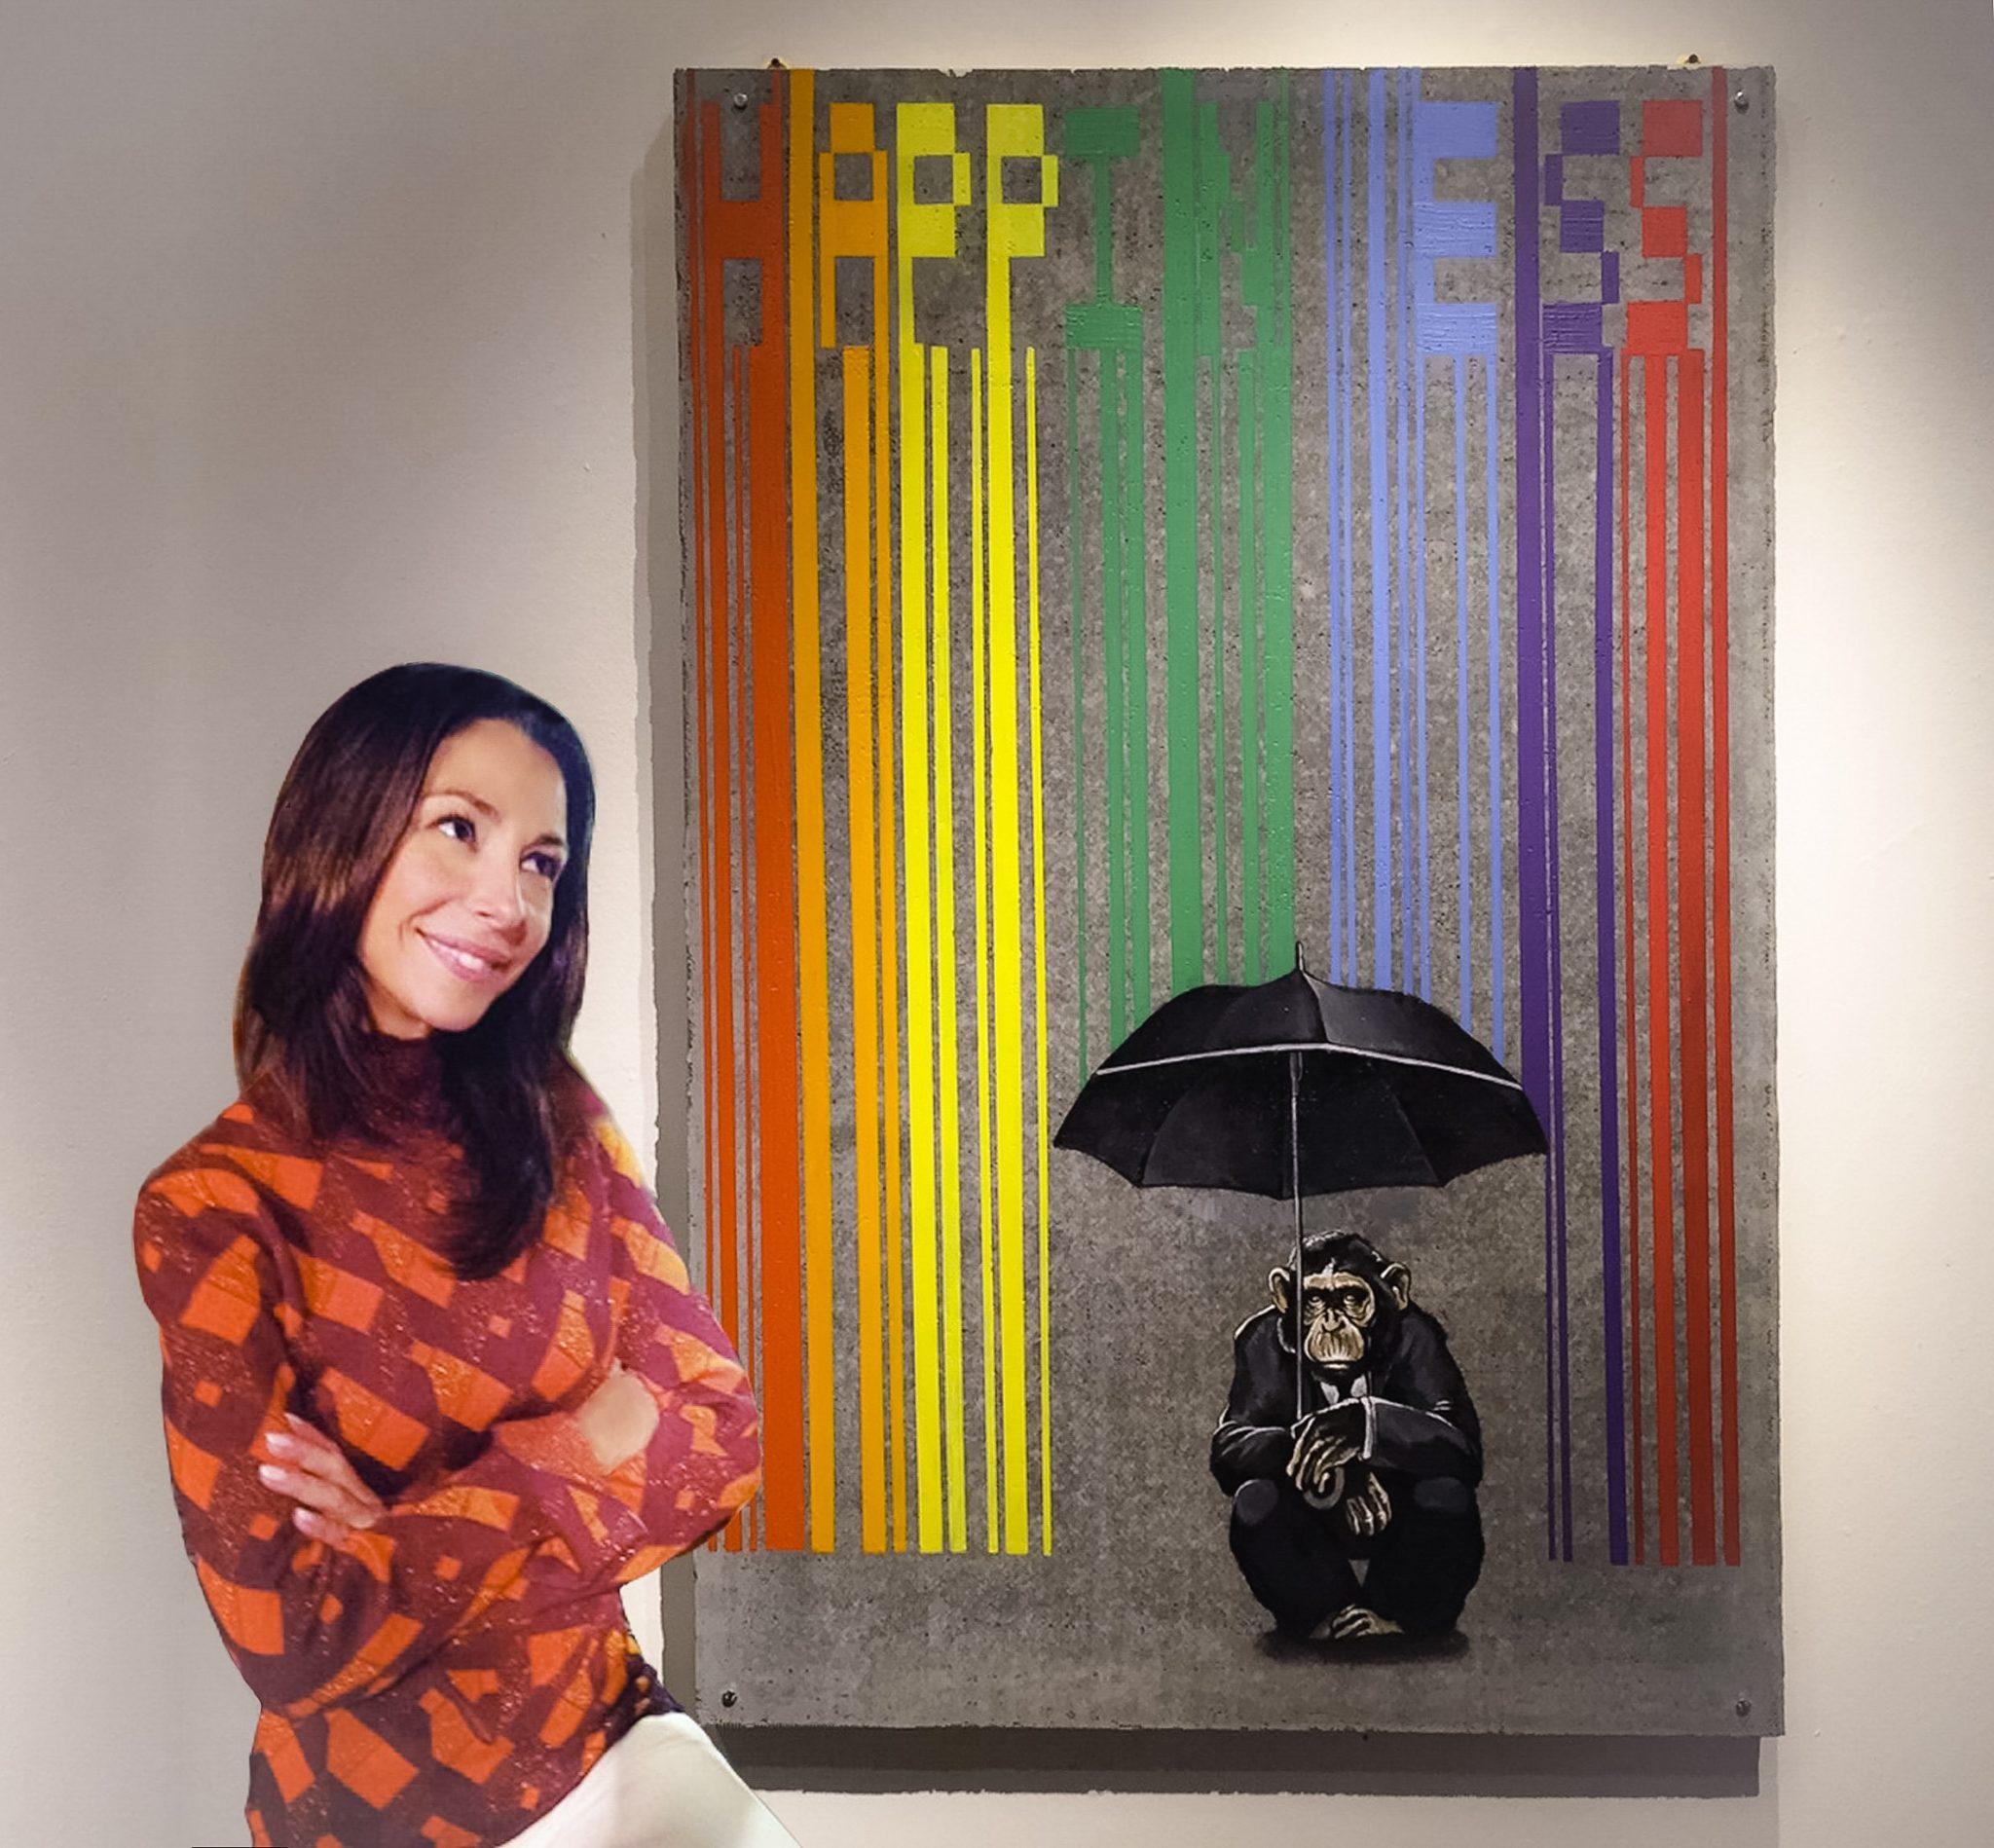 "#SELFIEADARTE ""Going around under an umbrella interferes with one's looking up at the sky"" #JerzyKosinski Happines @SimoneFugazzotto #Natiincattività #FondazioneMaimeri @CleliaPatella"